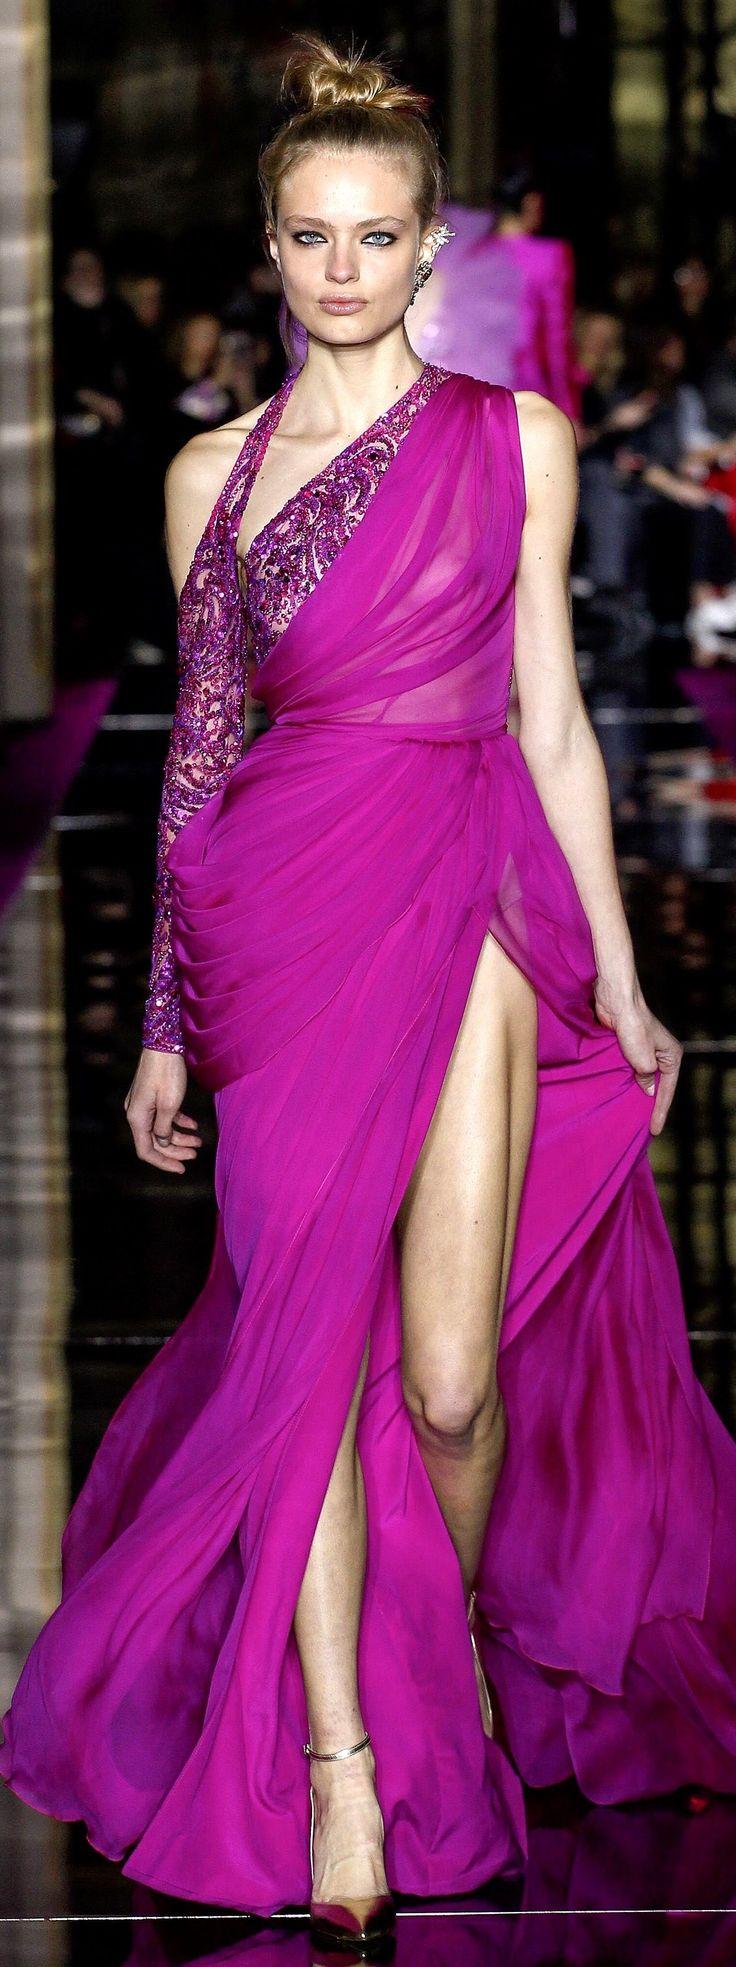 7493 best Vestidos Bonitos images on Pinterest   High fashion, Curve ...